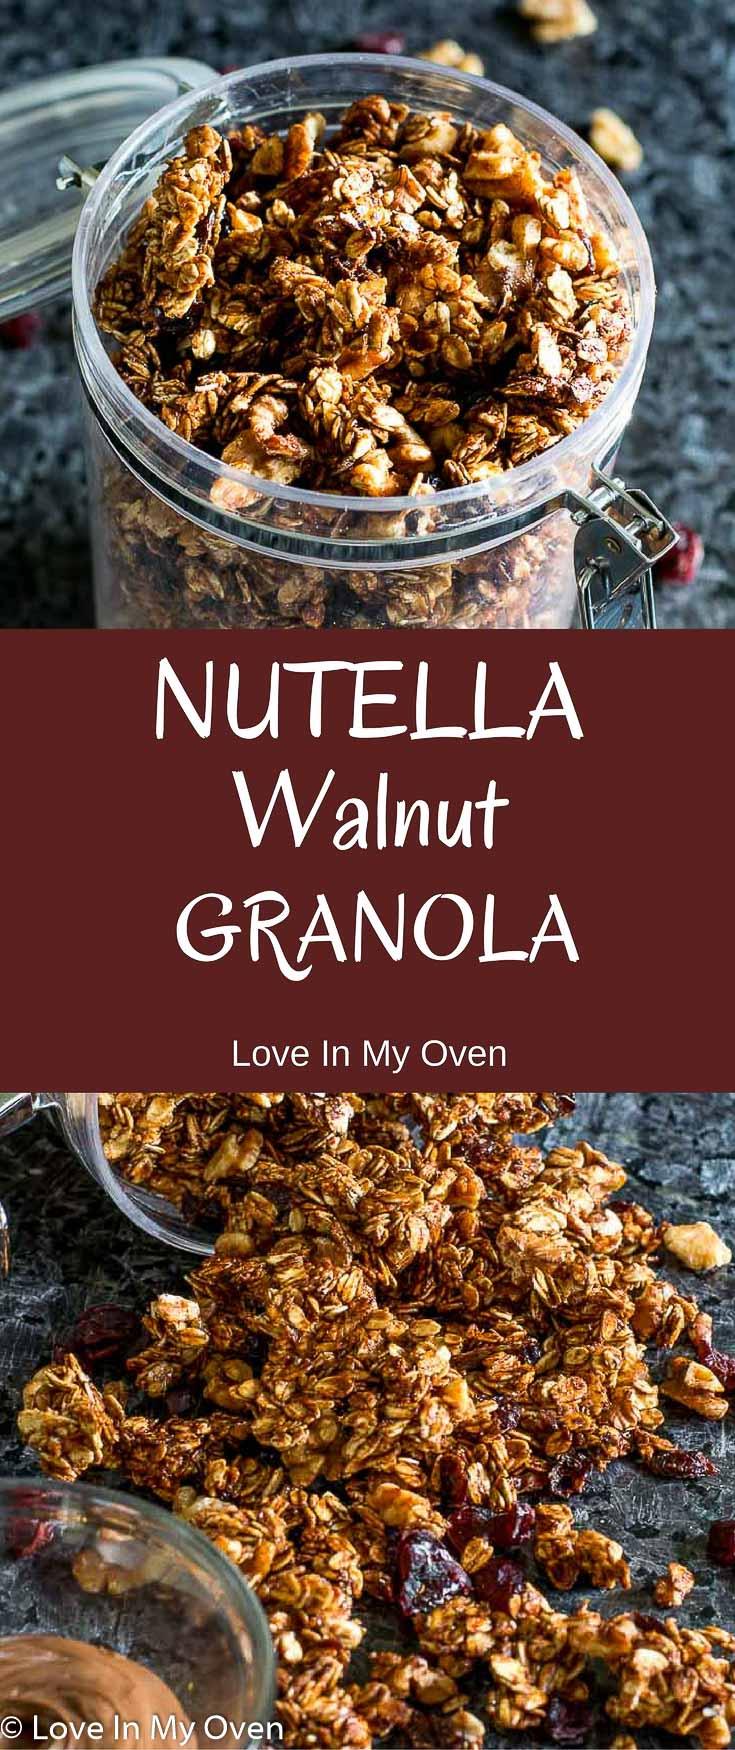 Chocolatey, nutty, crunchy granola. Breakfast, dessert, or a late-night snack!